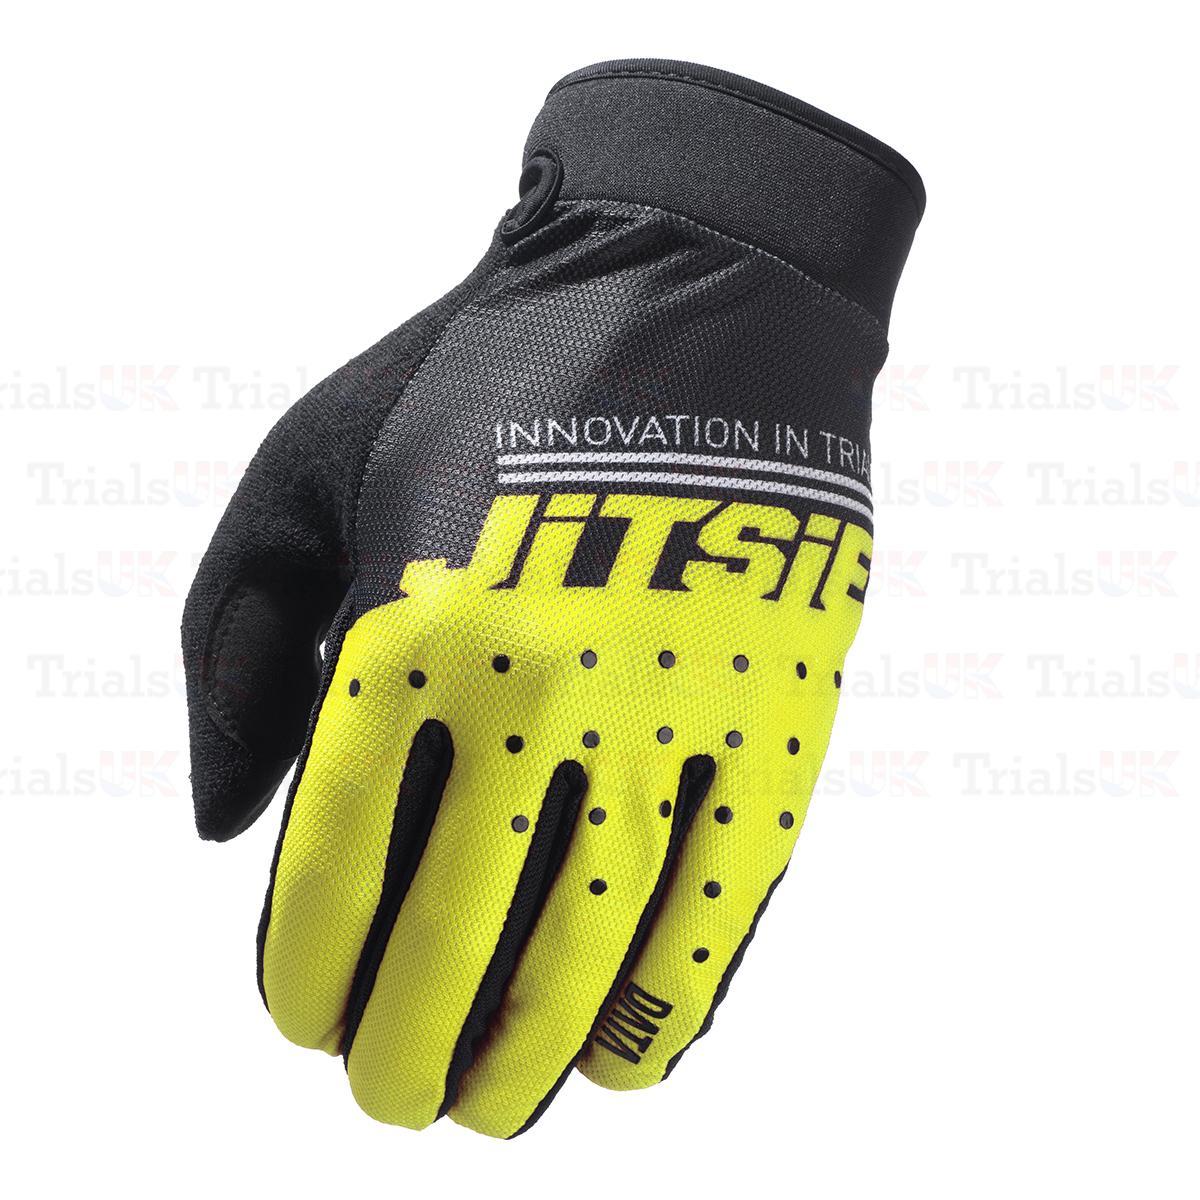 S3 POWER Trials Riding Gloves Yellow//Black-Trials-Offroad-Adventure FreePP